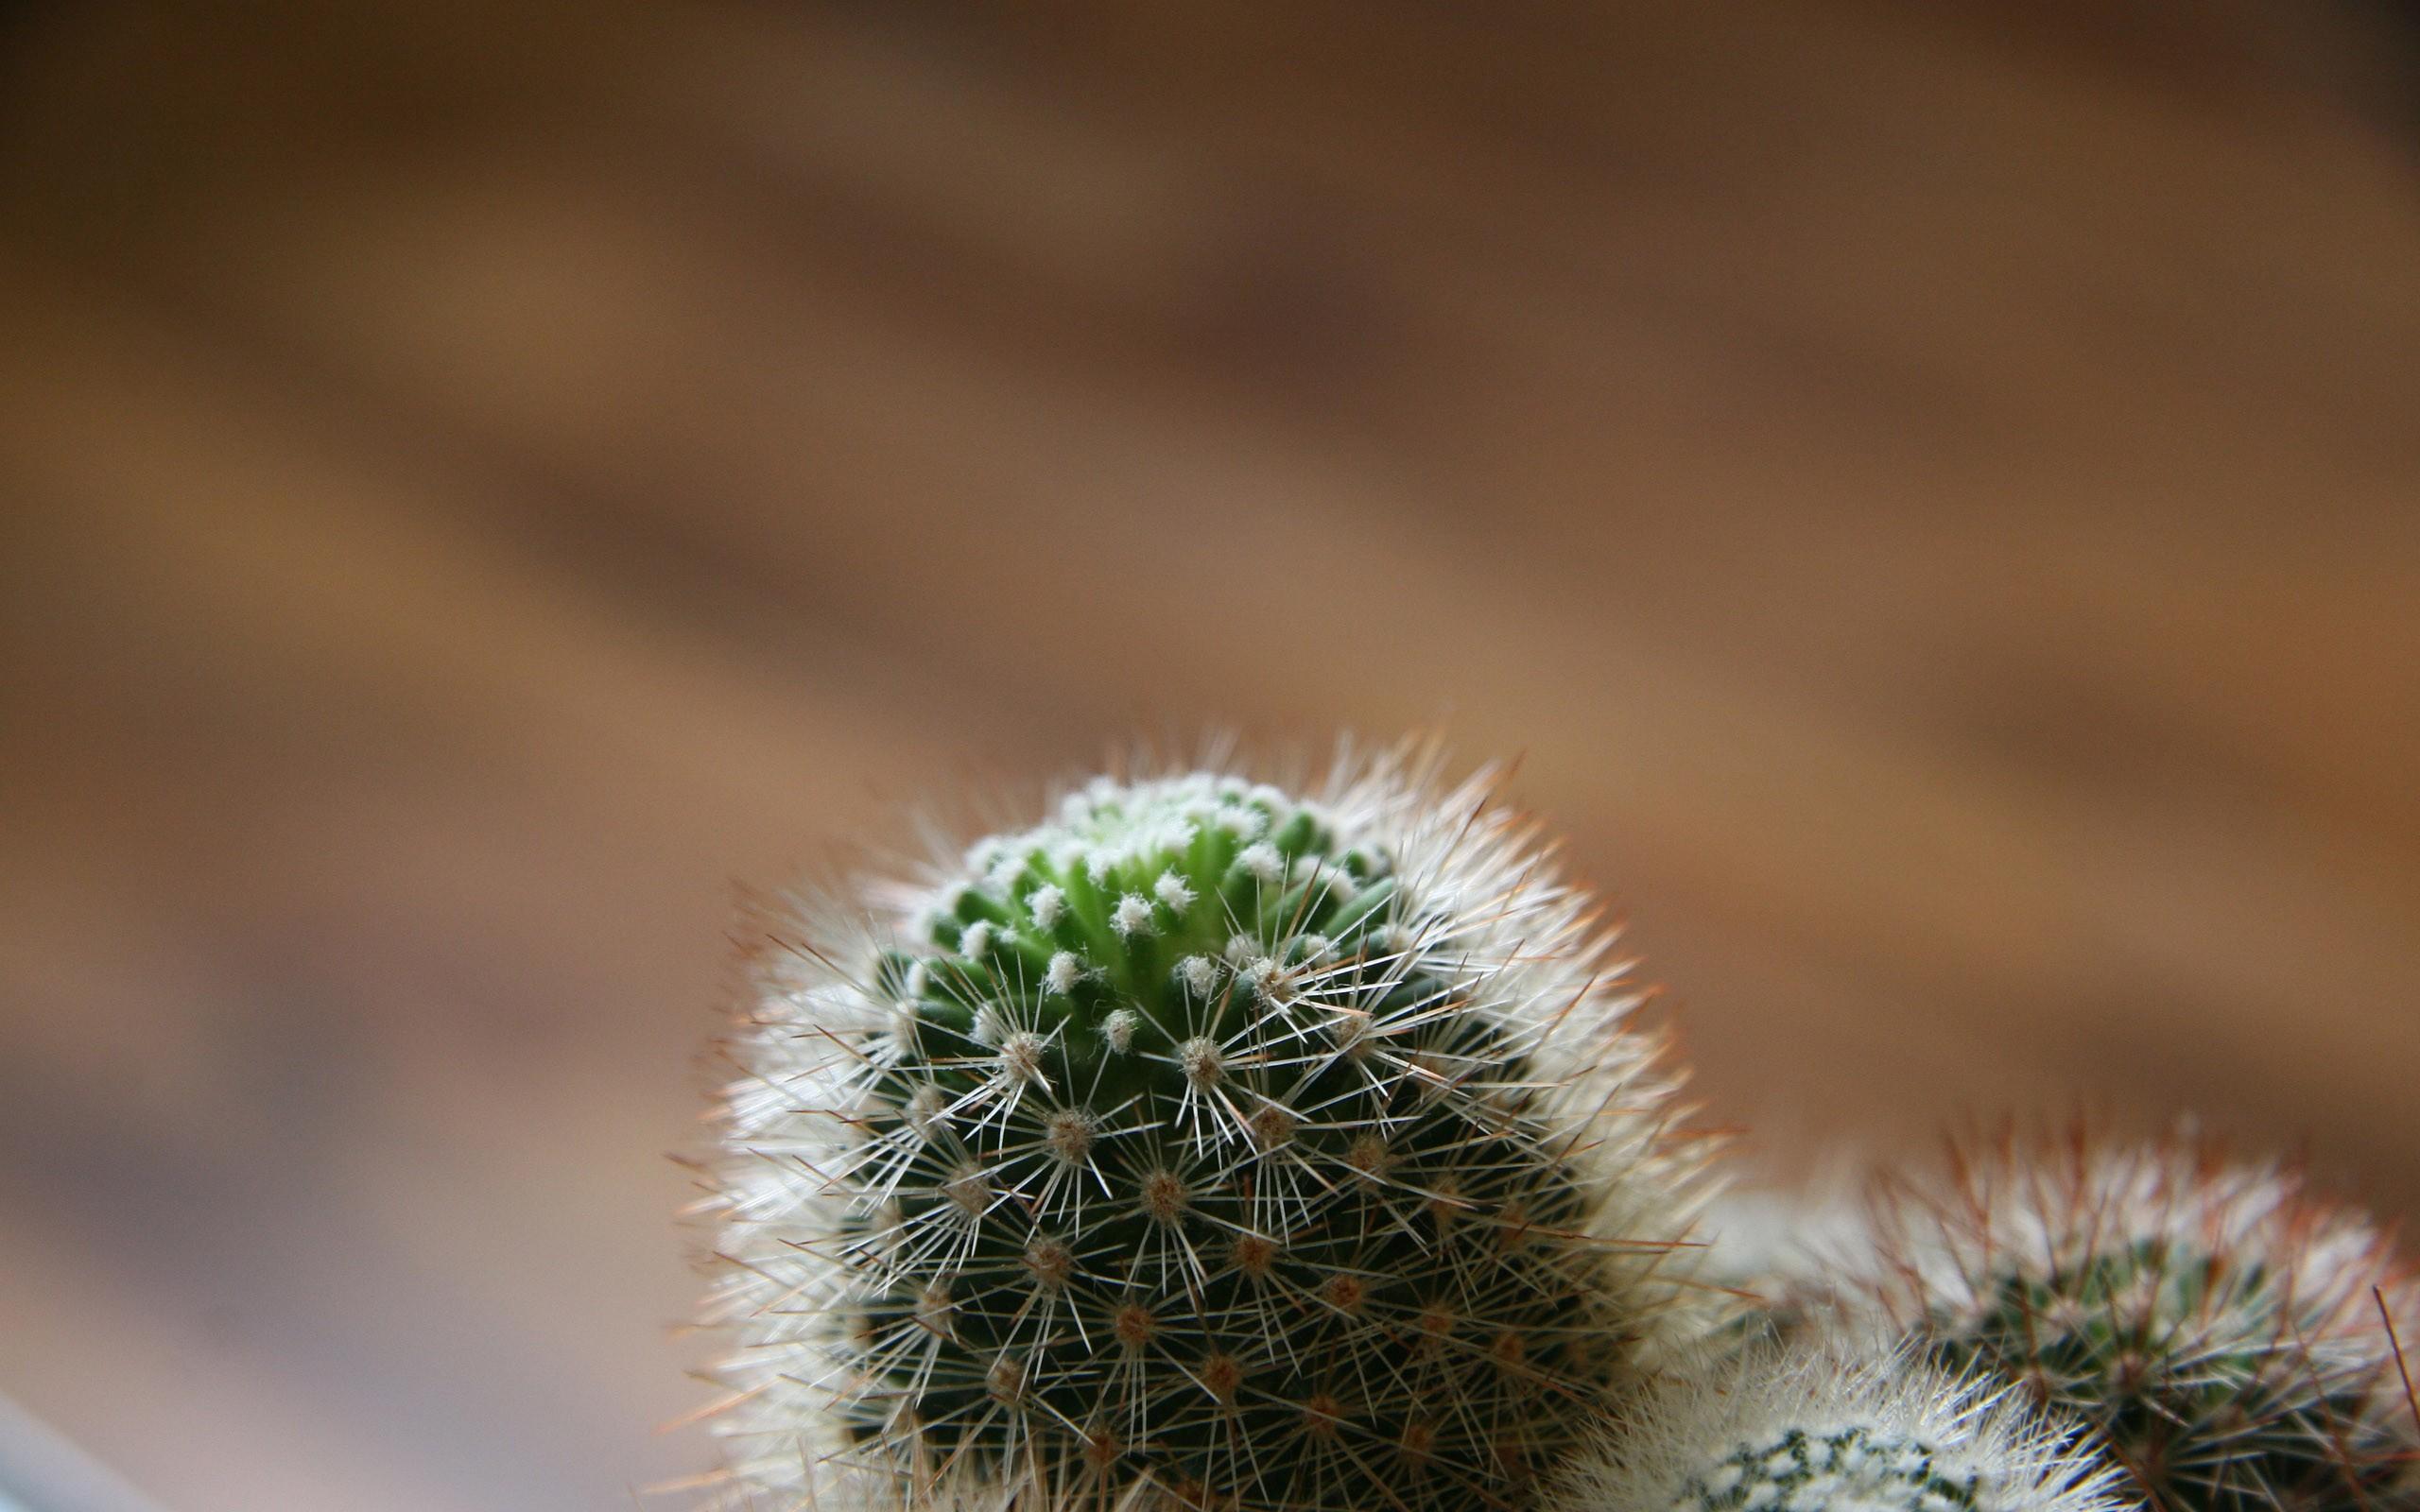 Cute Duck Hd Wallpaper Desert Cactus Images Hd Desktop Wallpapers 4k Hd